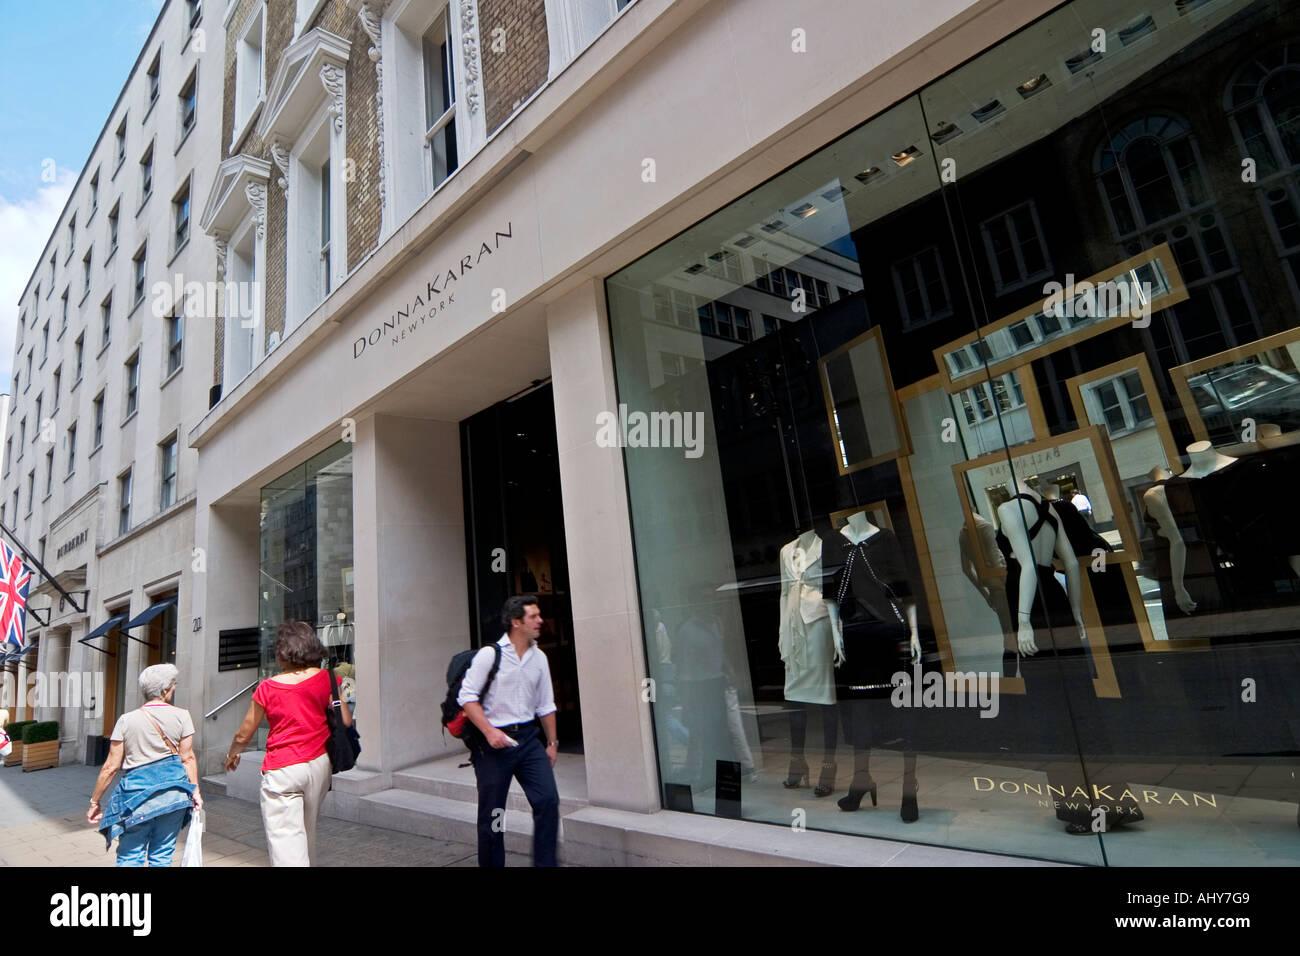 donna karan designer clothes store on bond street stock